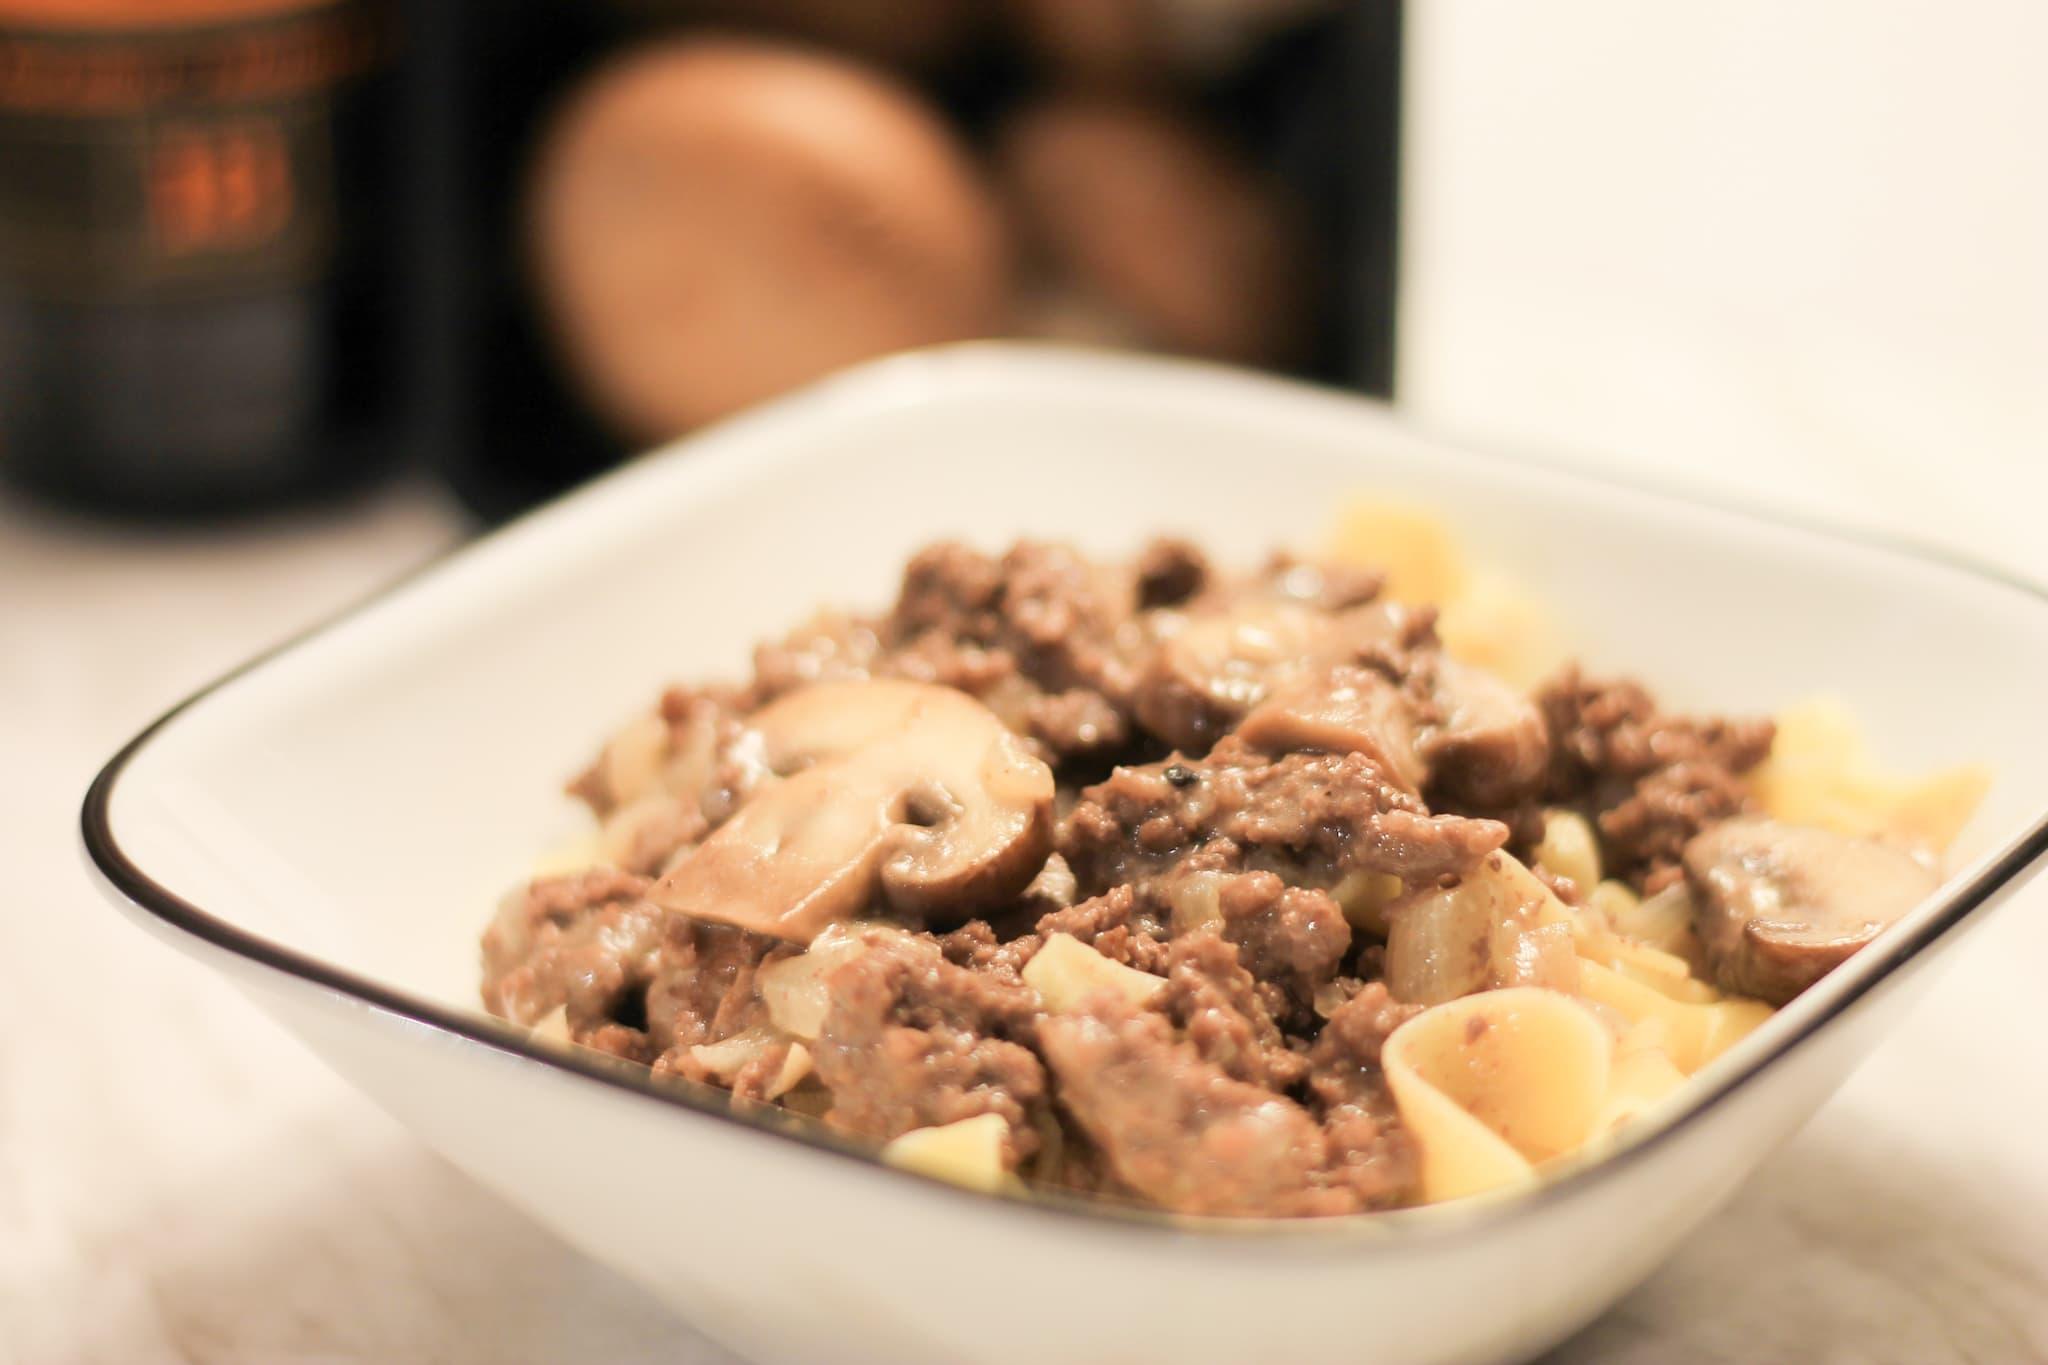 Ground Beef Stroganoff in white dish with cremini mushrooms blurred behind